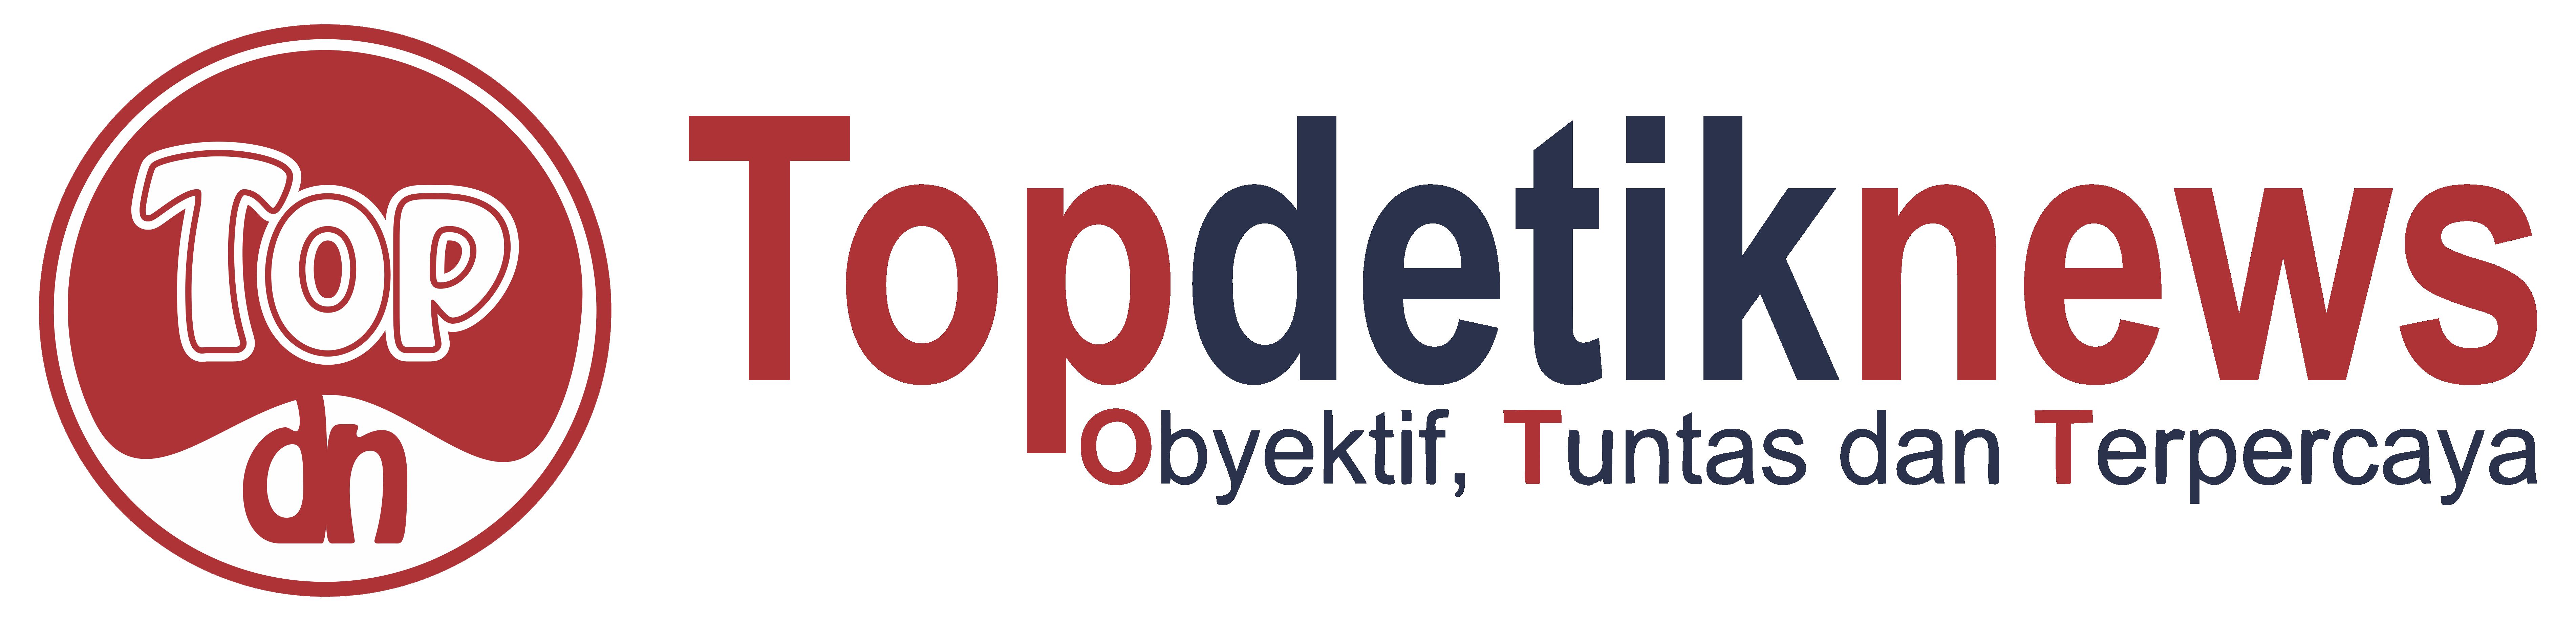 Topdetiknews